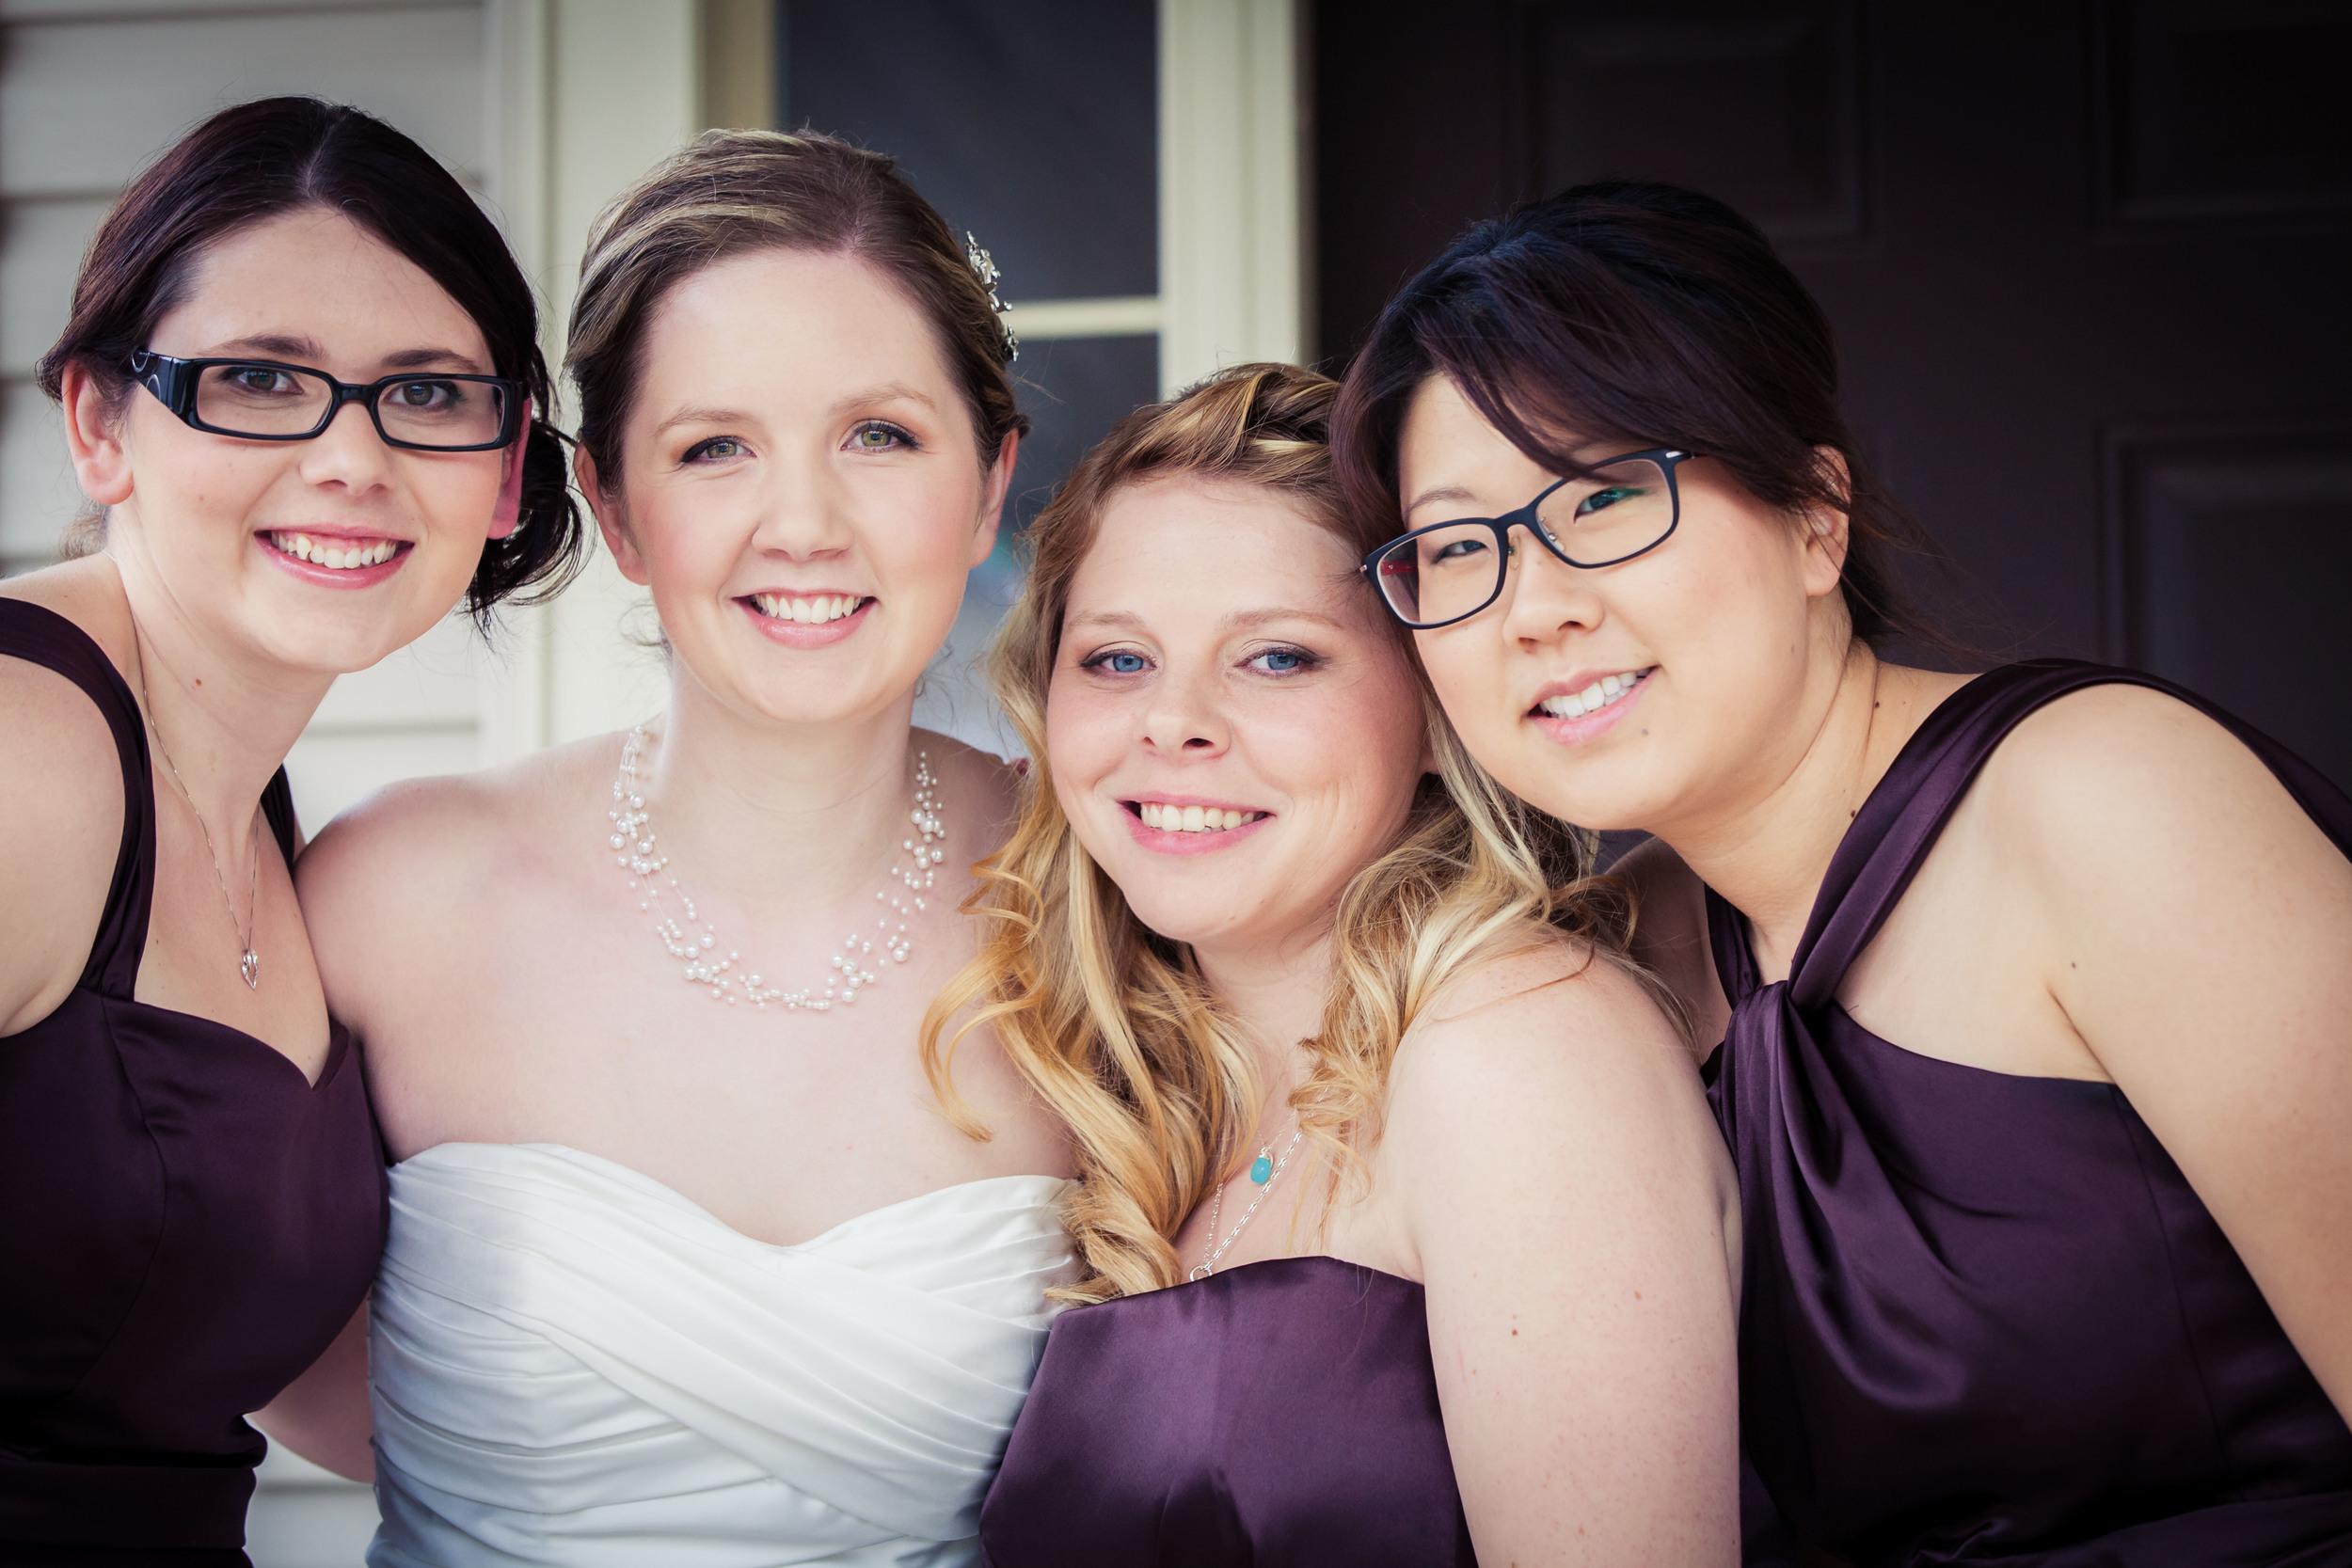 toronto_wedding_photography-Steph_Troy-11.jpg